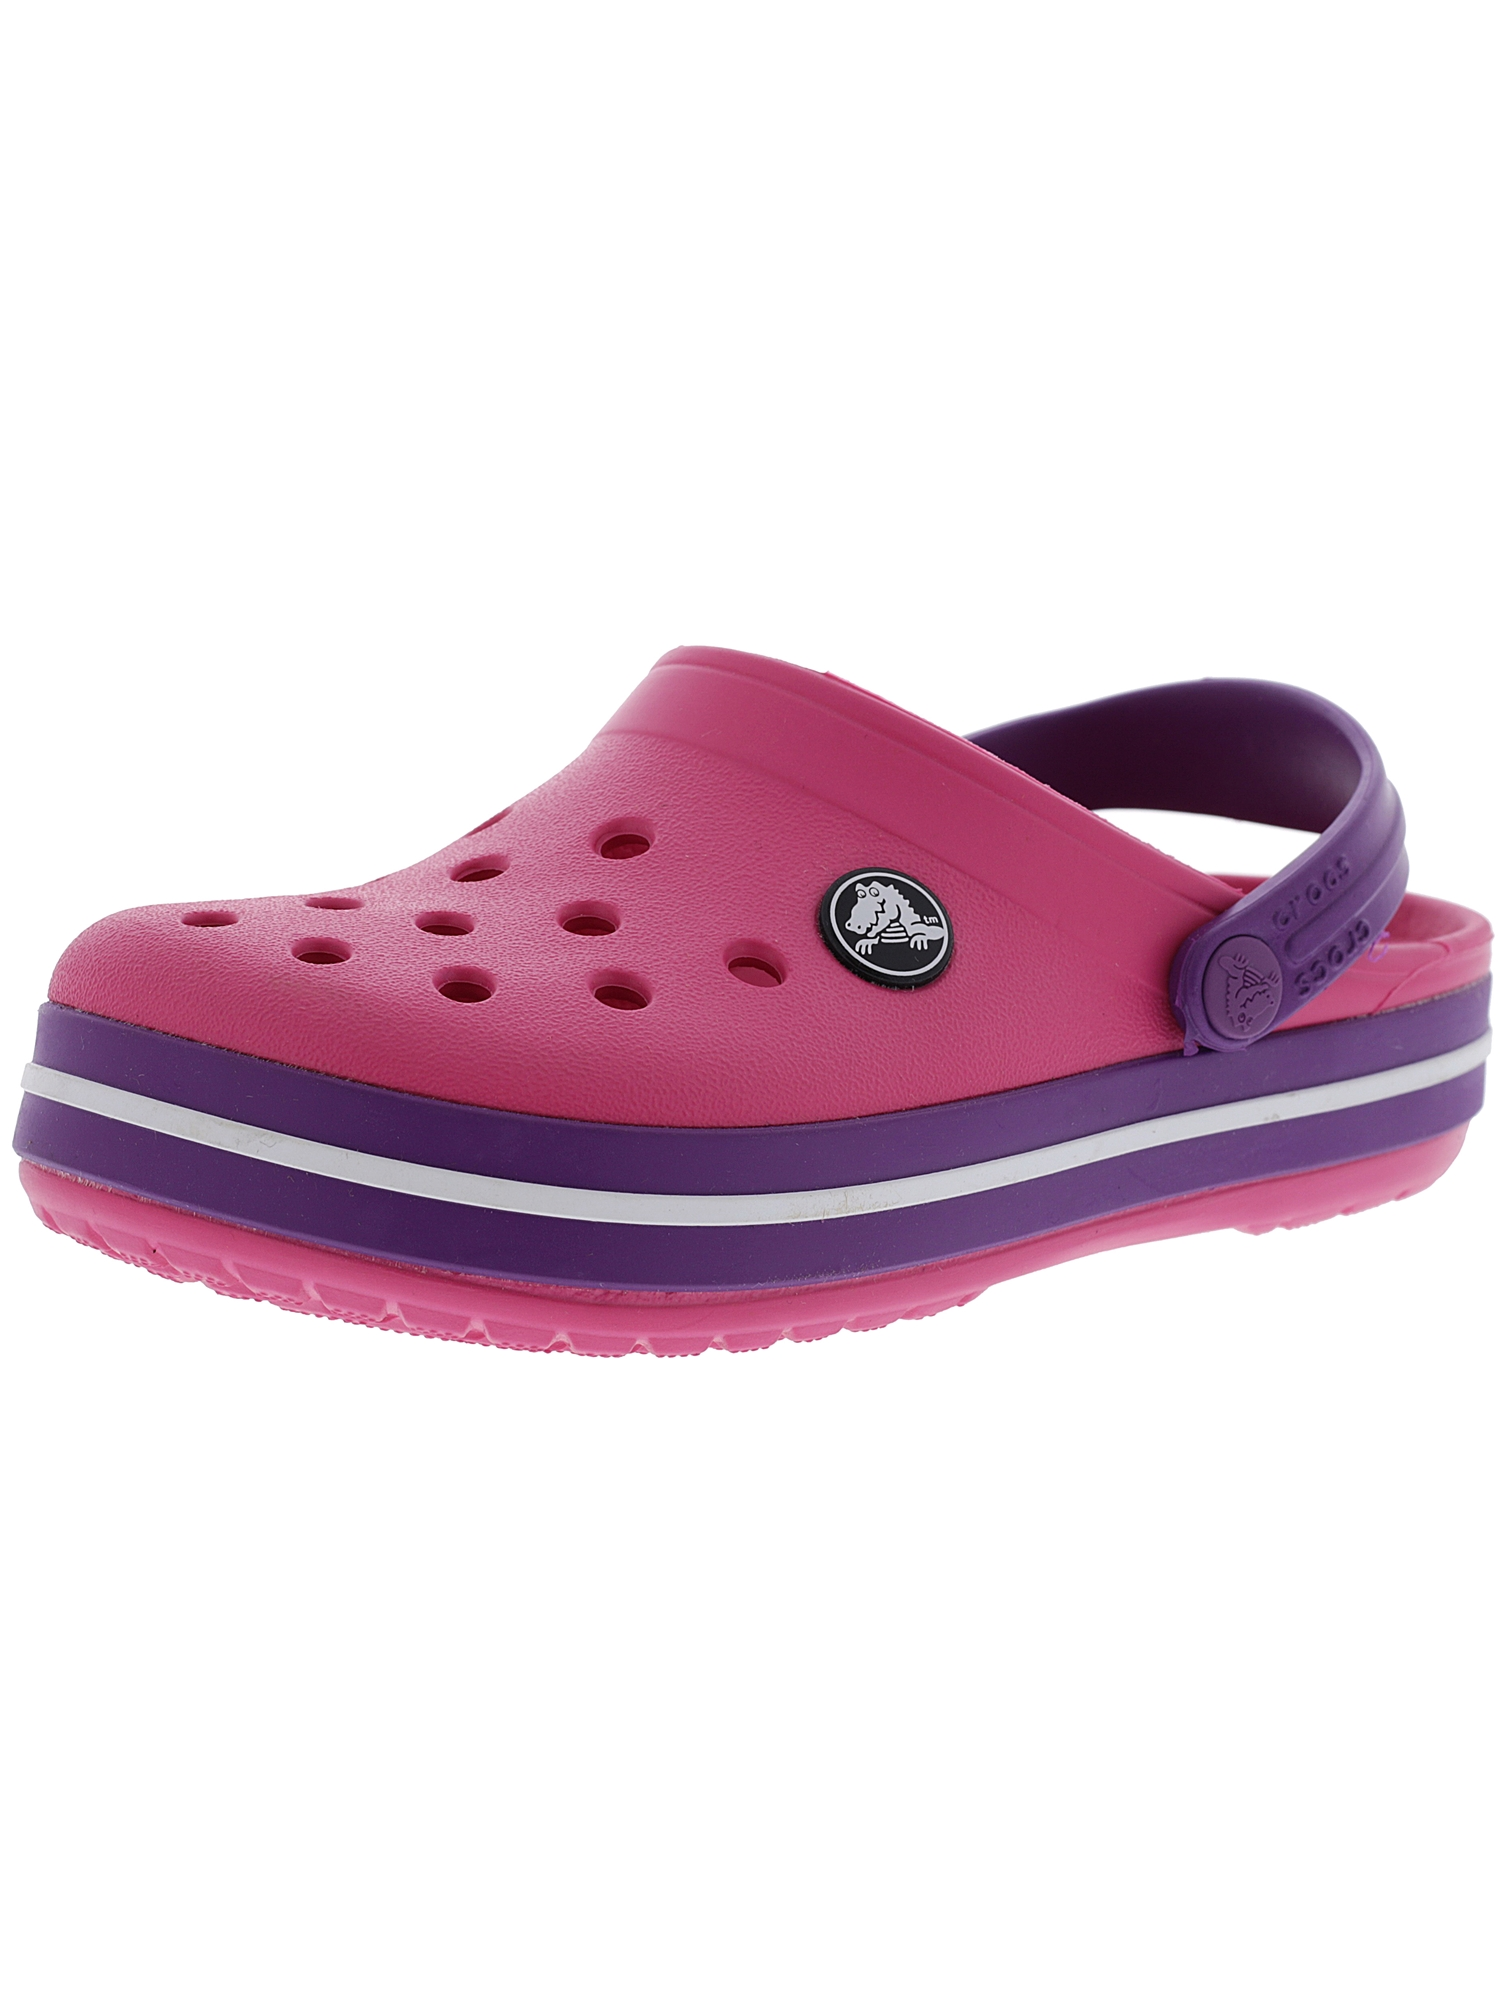 Crocs Kids Crocband Clog Ltd Navy / Citrus Clogs - 7M